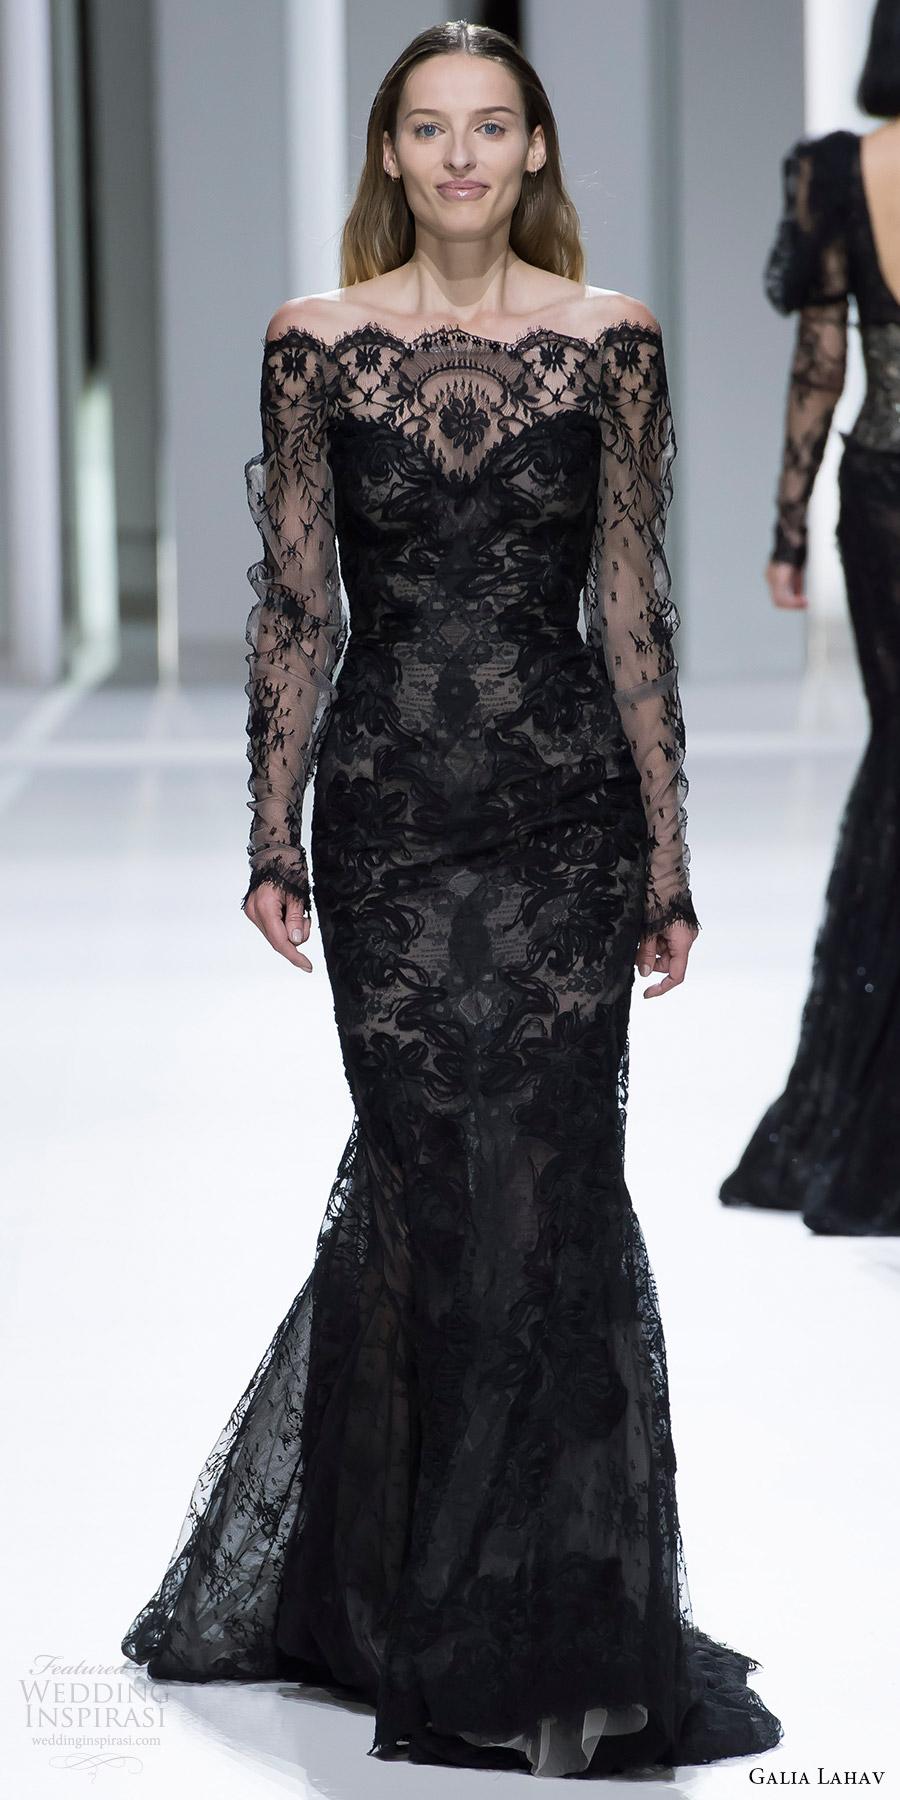 galia lahav haute couture spring 2017 (paige) gown